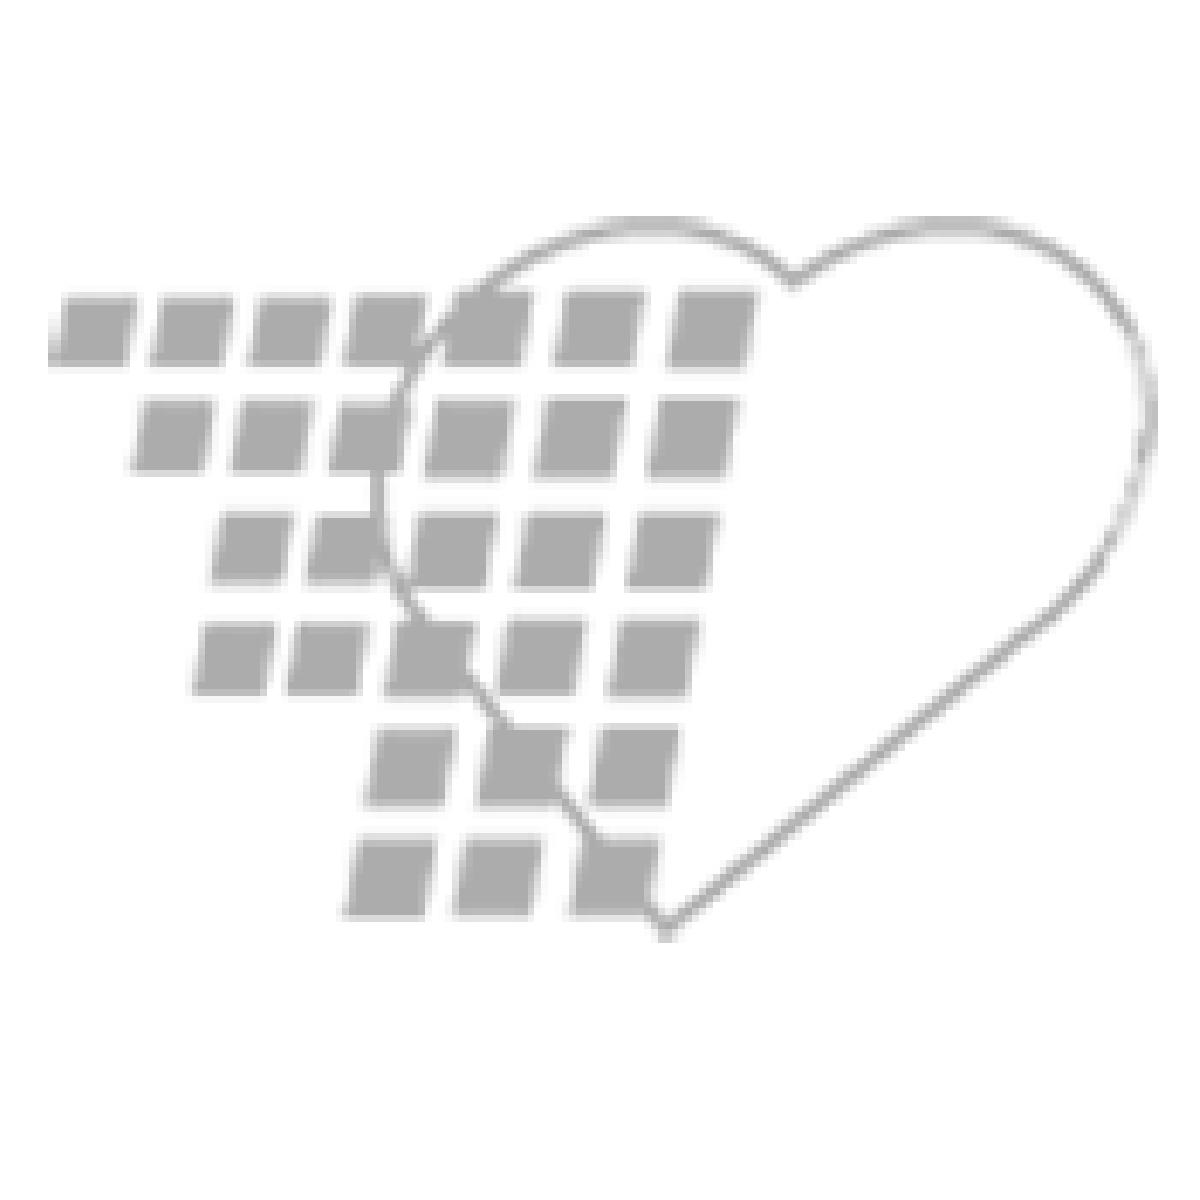 02-24-0003 - Vital Signs Monitor BP, QuickTemp, SPO2